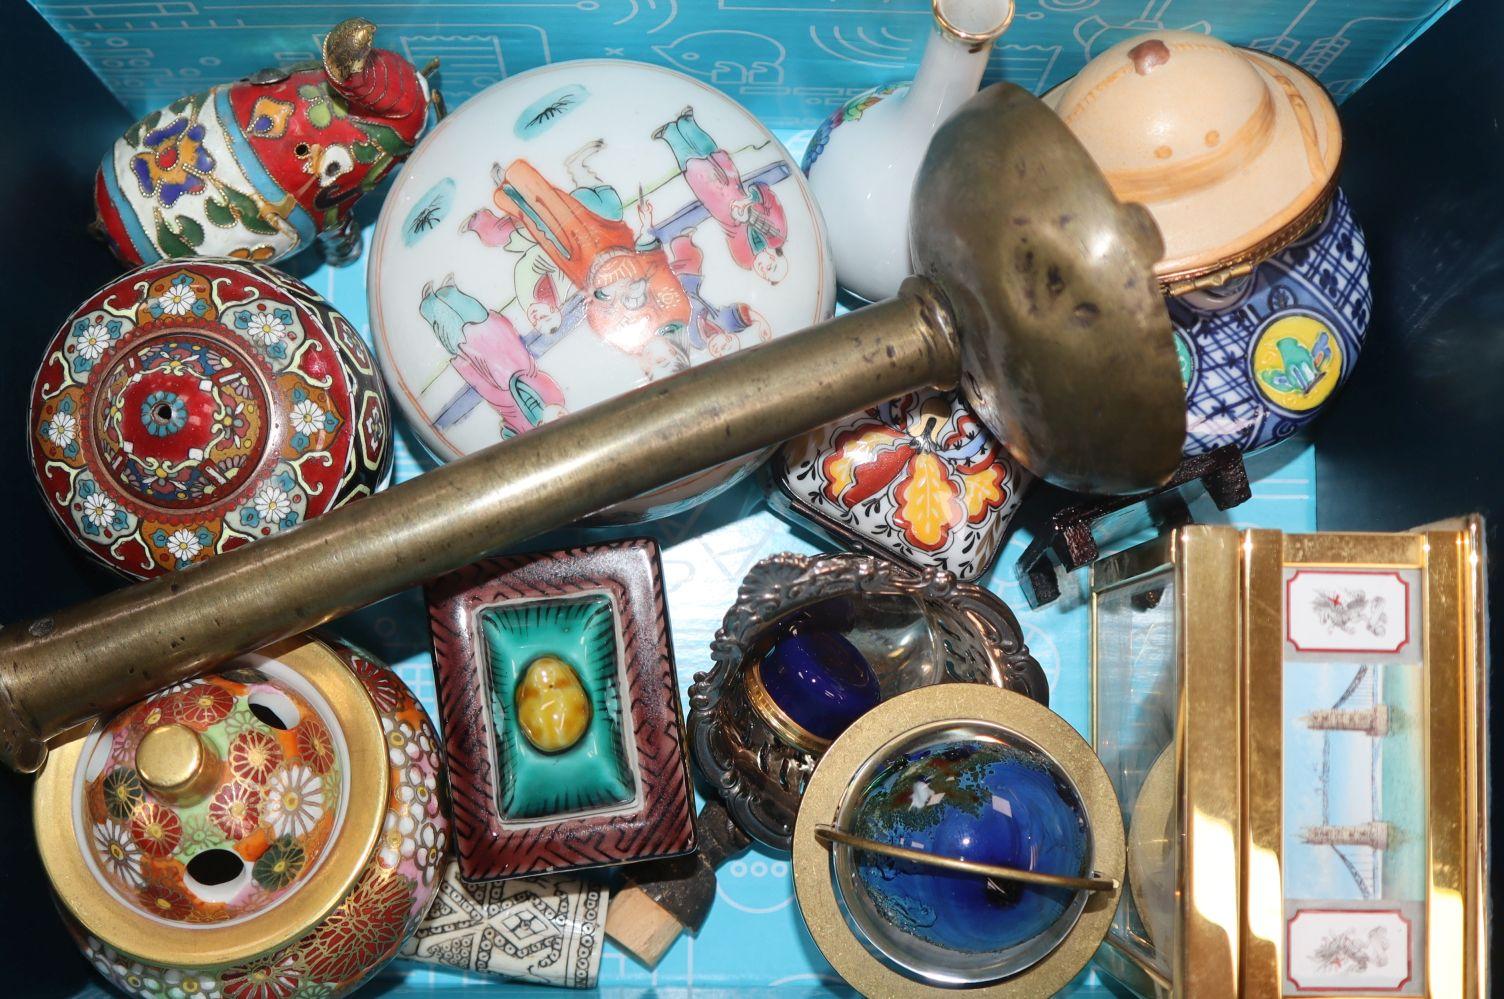 Sundry ceramics and ornaments including a Moorcroft vase